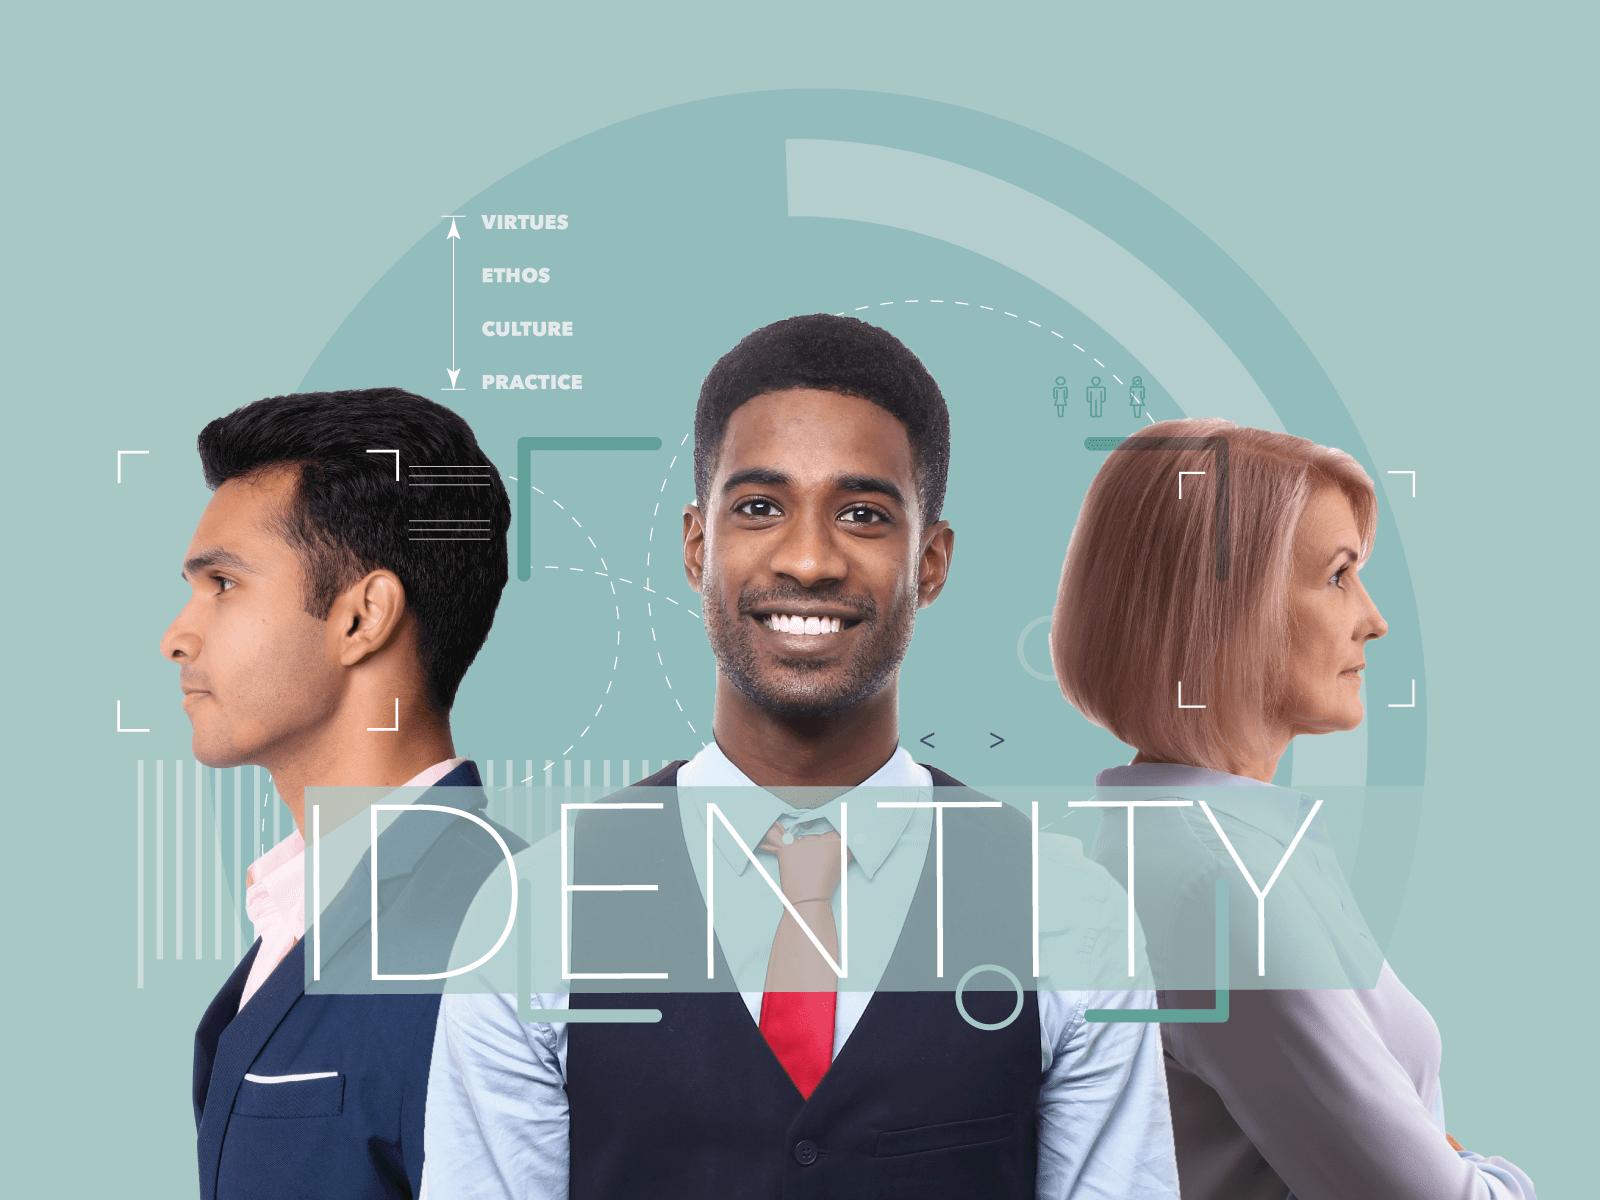 Principle 2 - identity